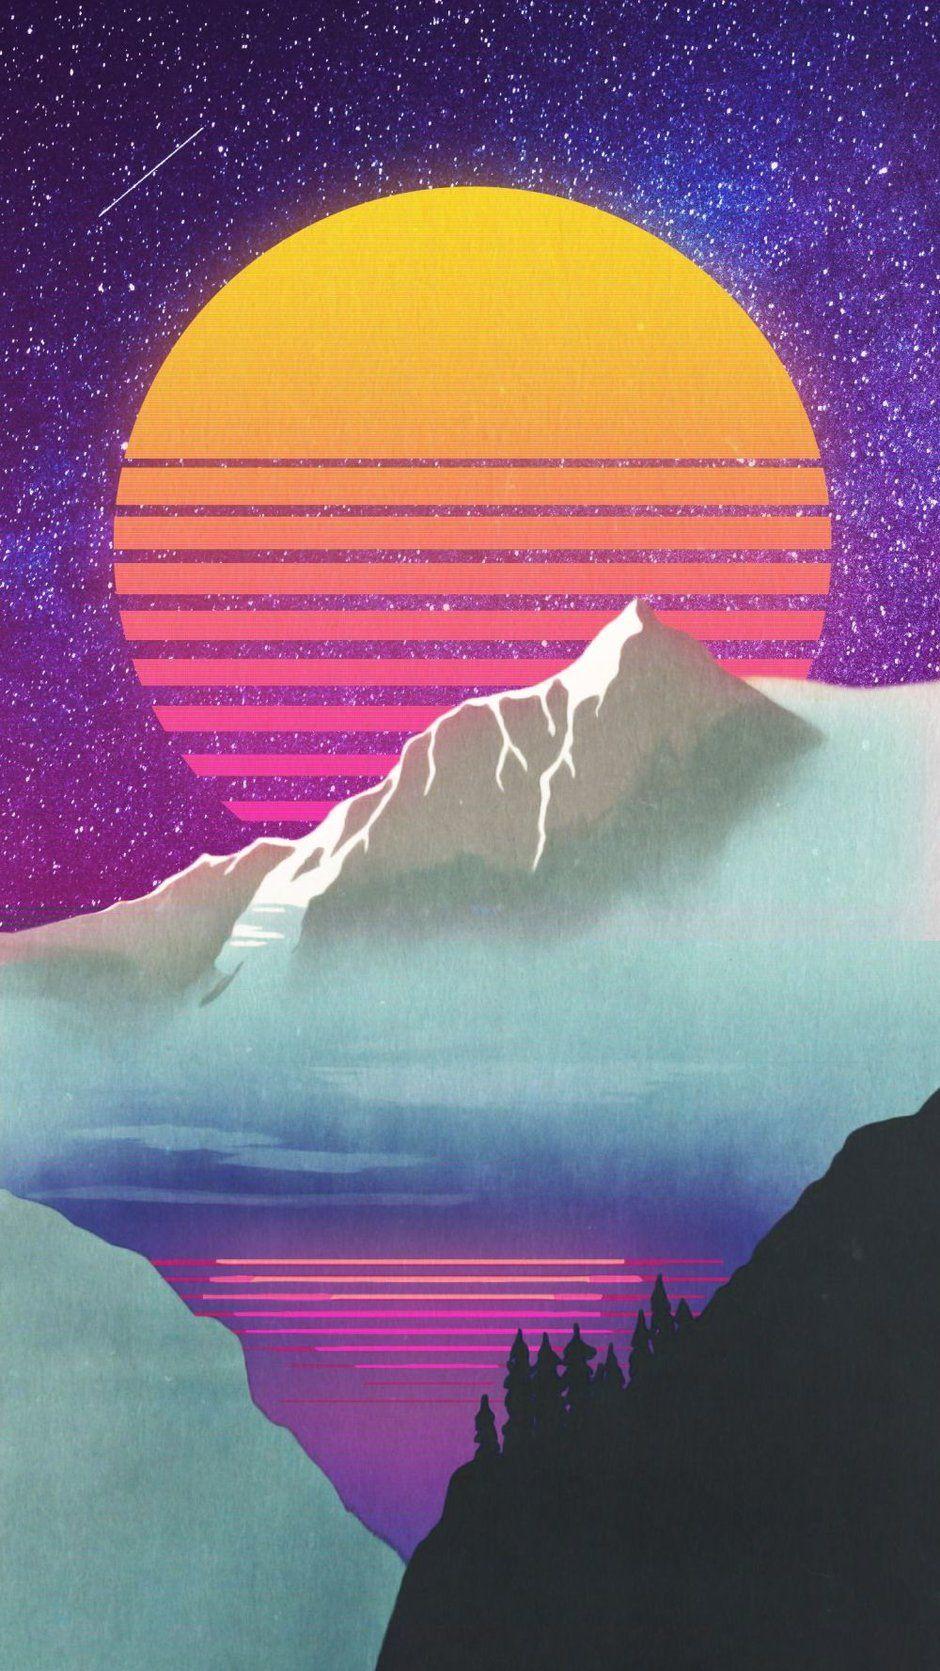 Pin by busanthighs97 on Wallpaper Landscape wallpaper